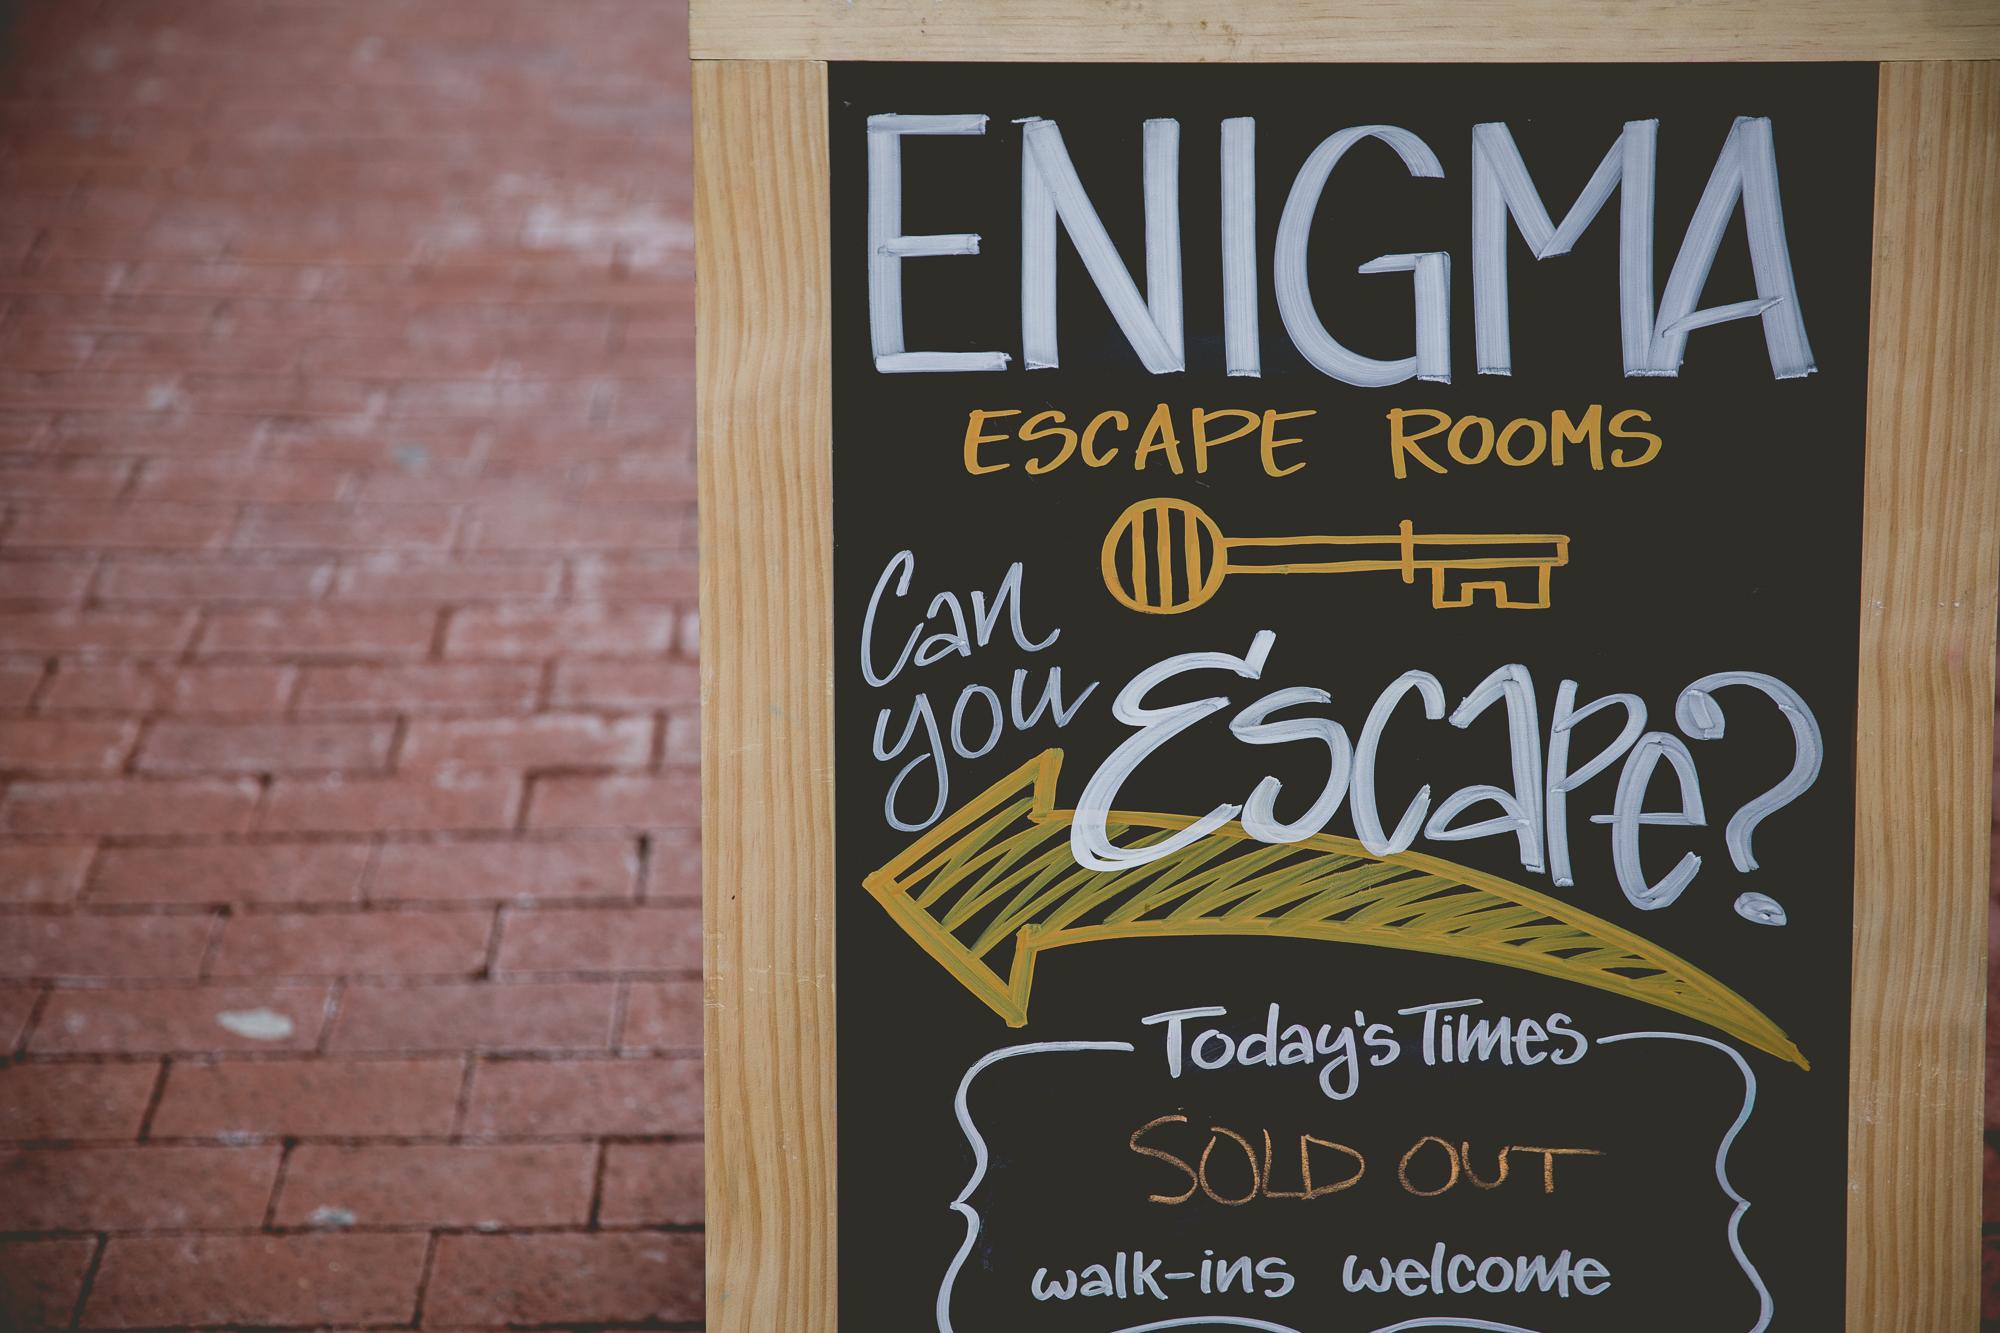 Enigma-026.jpg